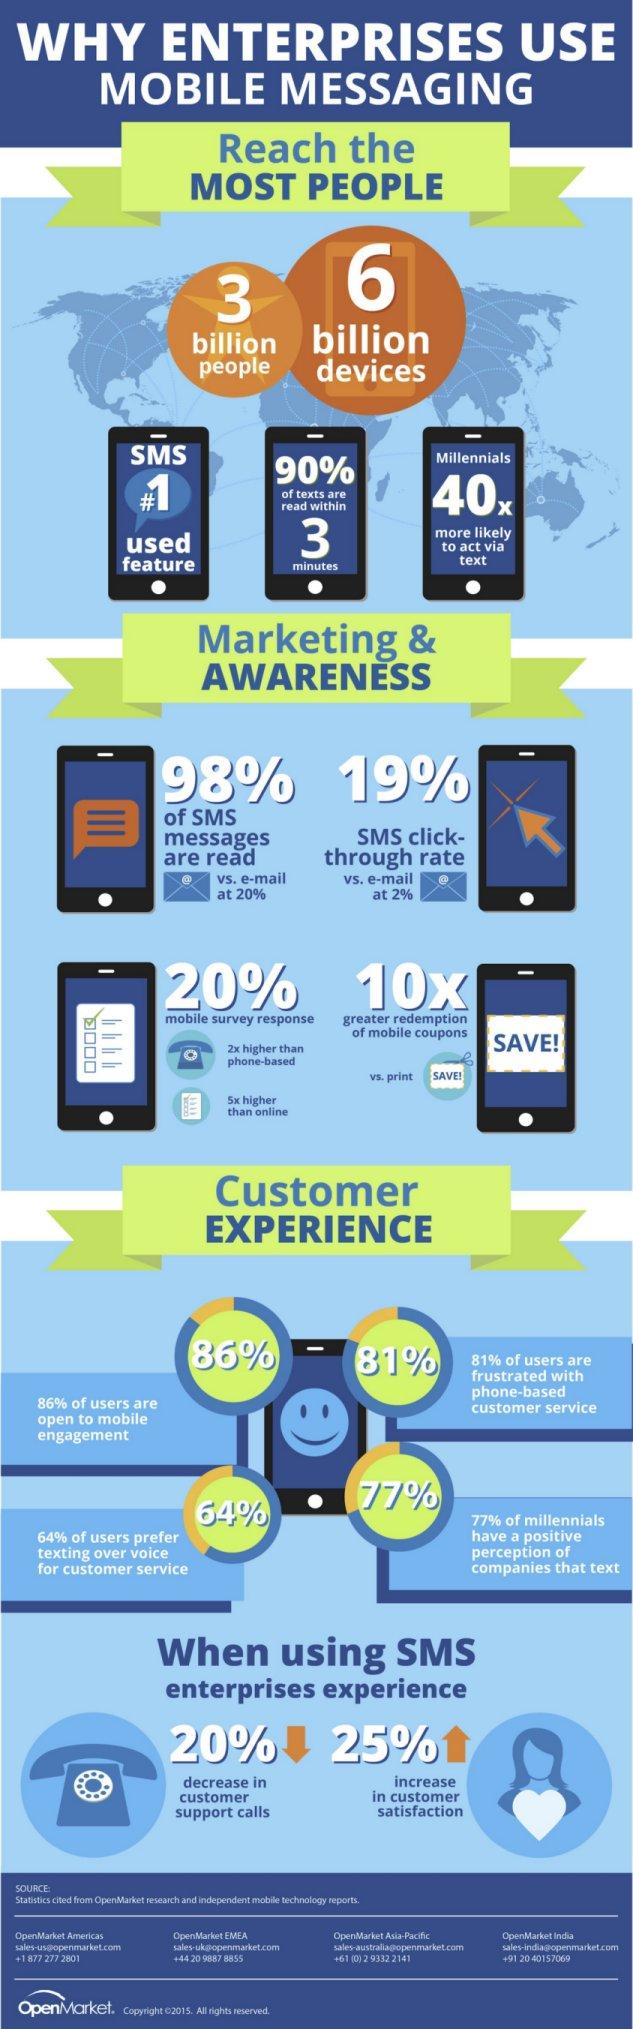 Why Enterprises Use Mobile Marketing